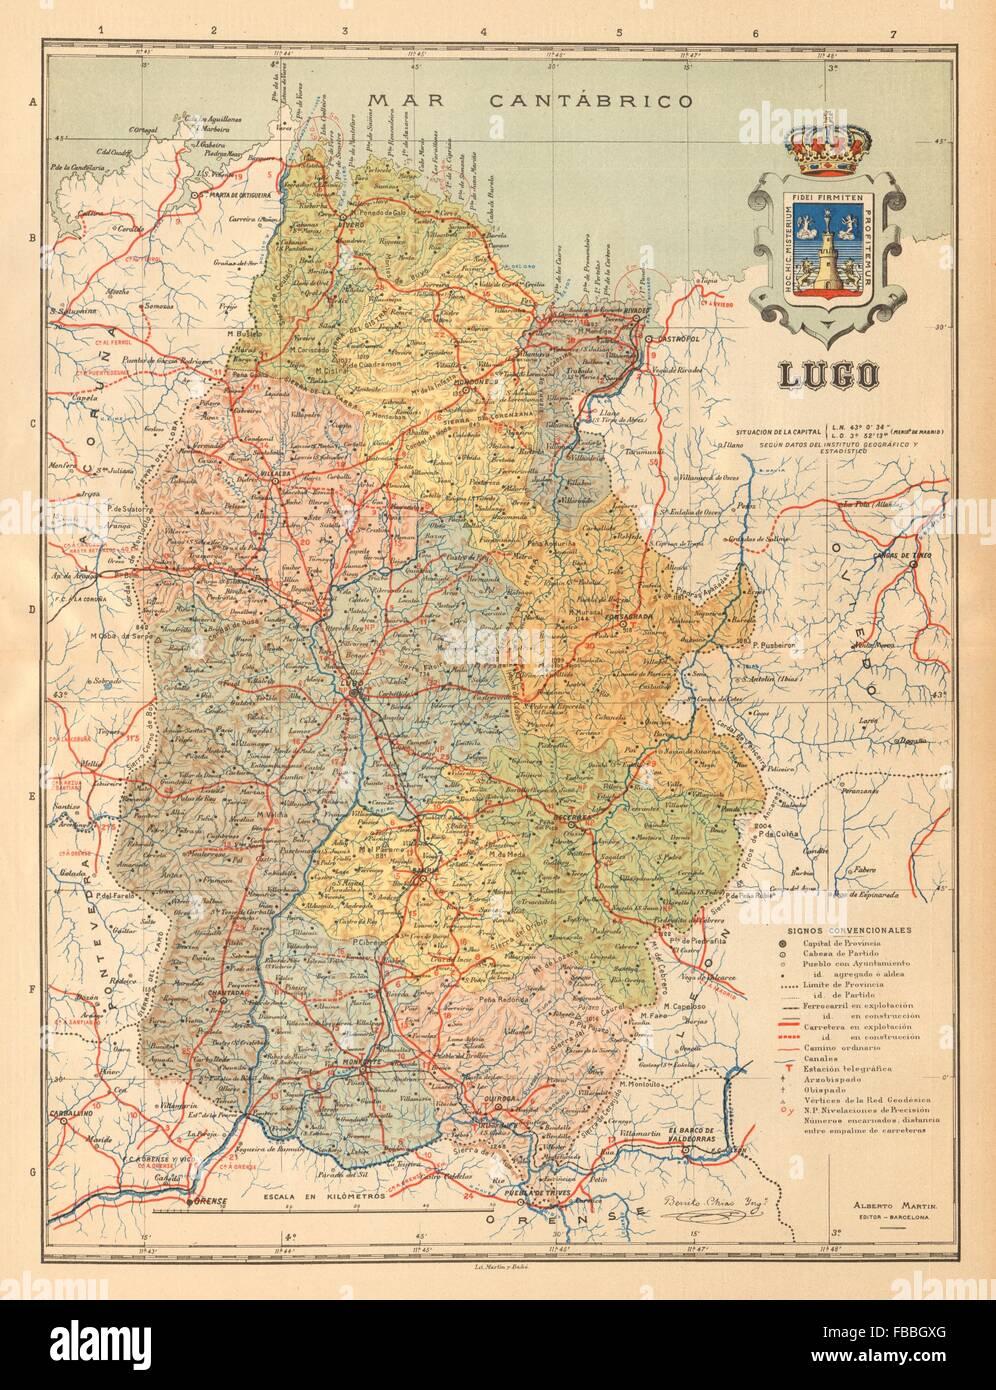 Lugo Galicia Mapa Antiguo De La Provincia Alberto Martin C1911